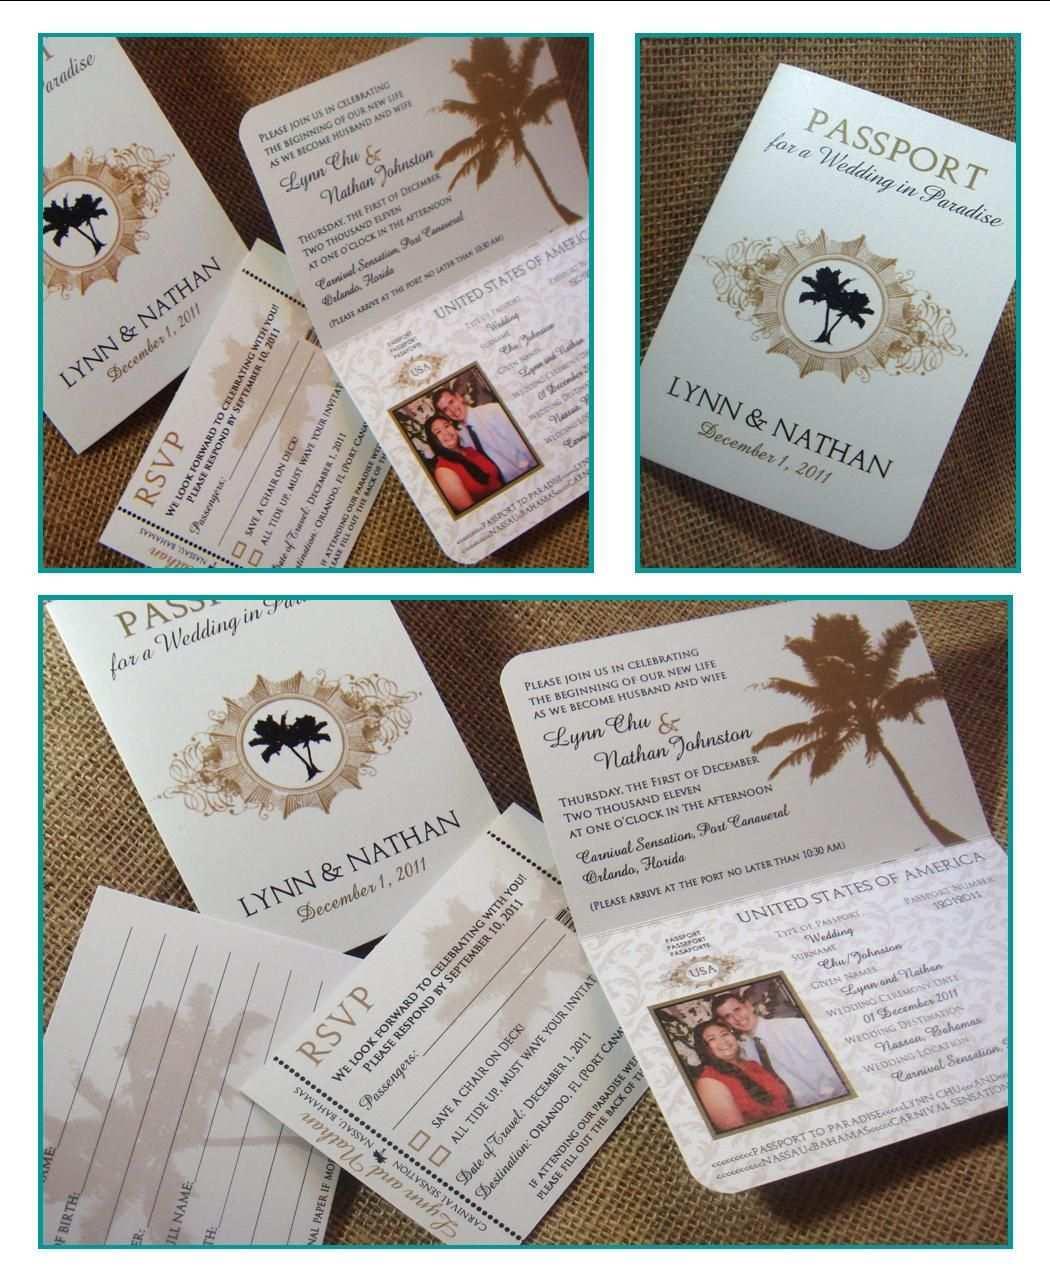 40 Free Free Passport Wedding Invitation Template Templates by Free Passport Wedding Invitation Template